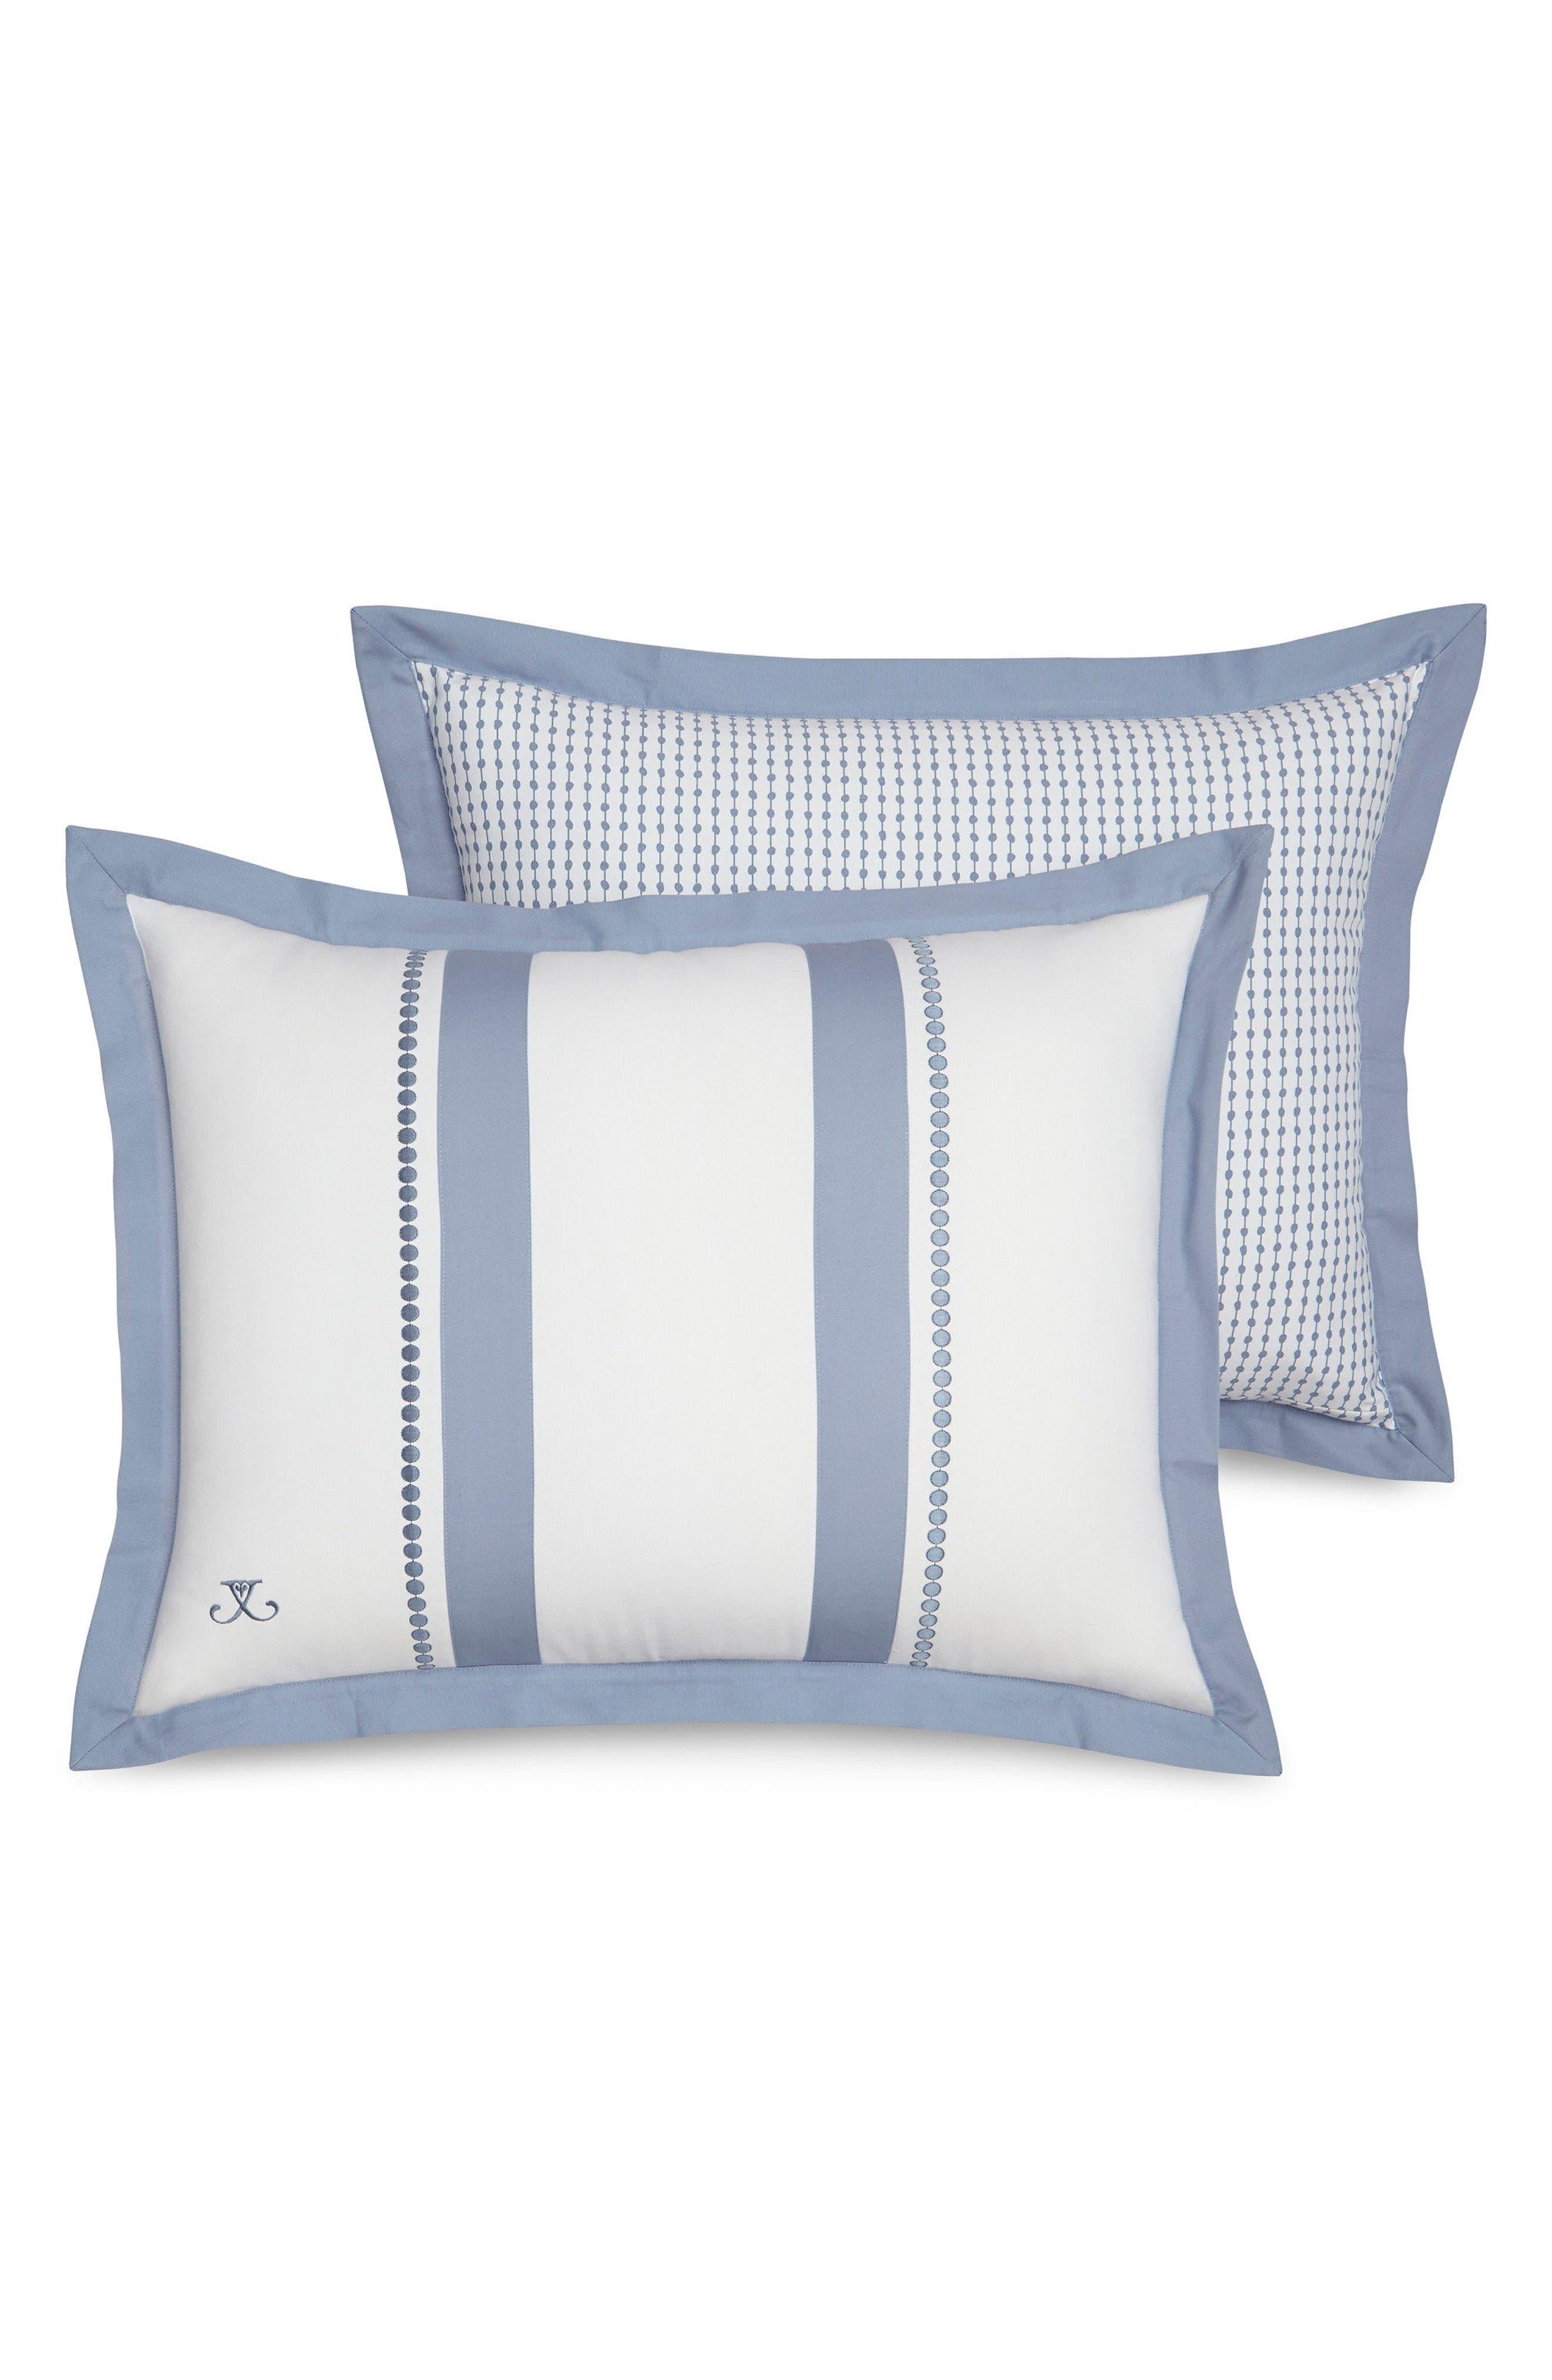 London Standard Sham,                         Main,                         color, White/ Blue